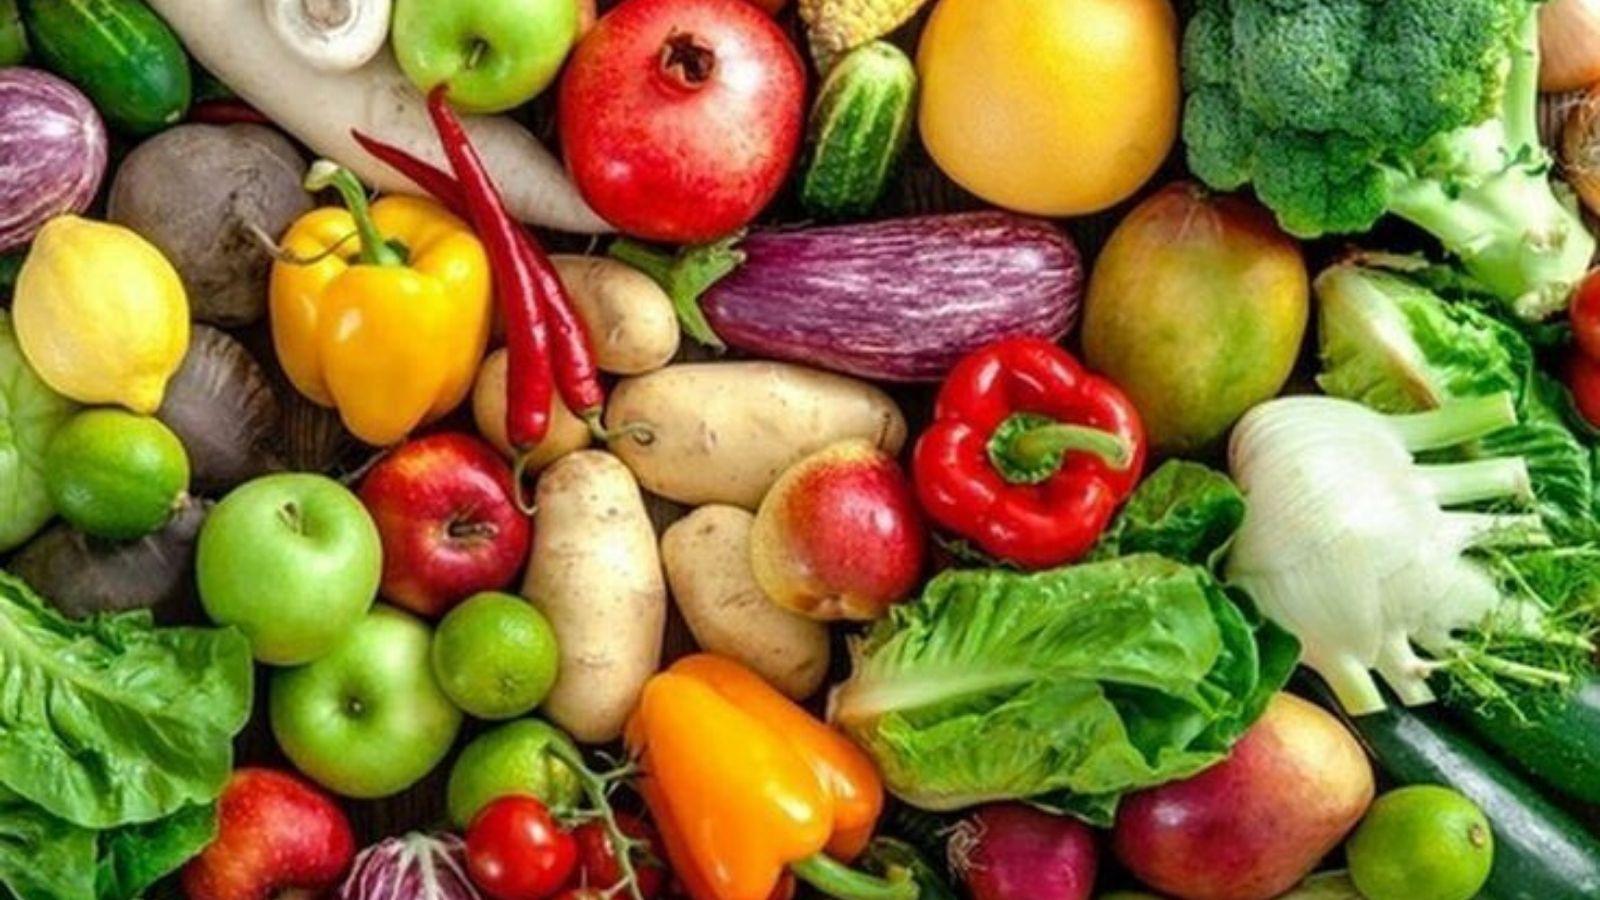 diy-fruit-and-veggie-wash